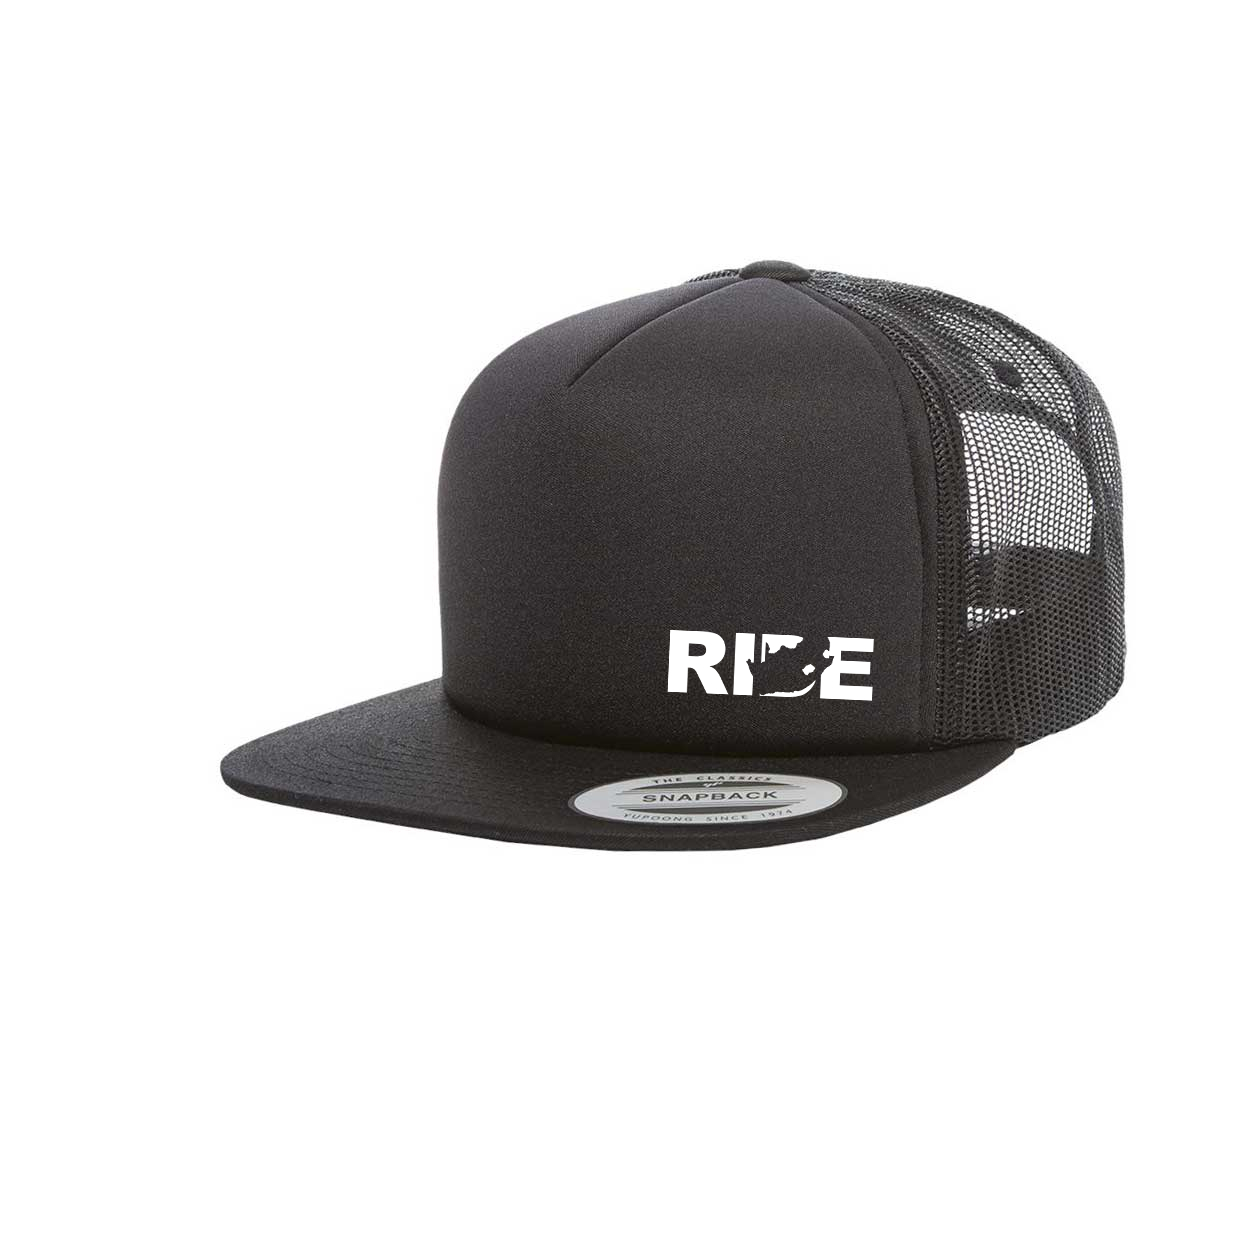 Ride South Africa Night Out Premium Foam Flat Brim Snapback Hat Black (White Logo)